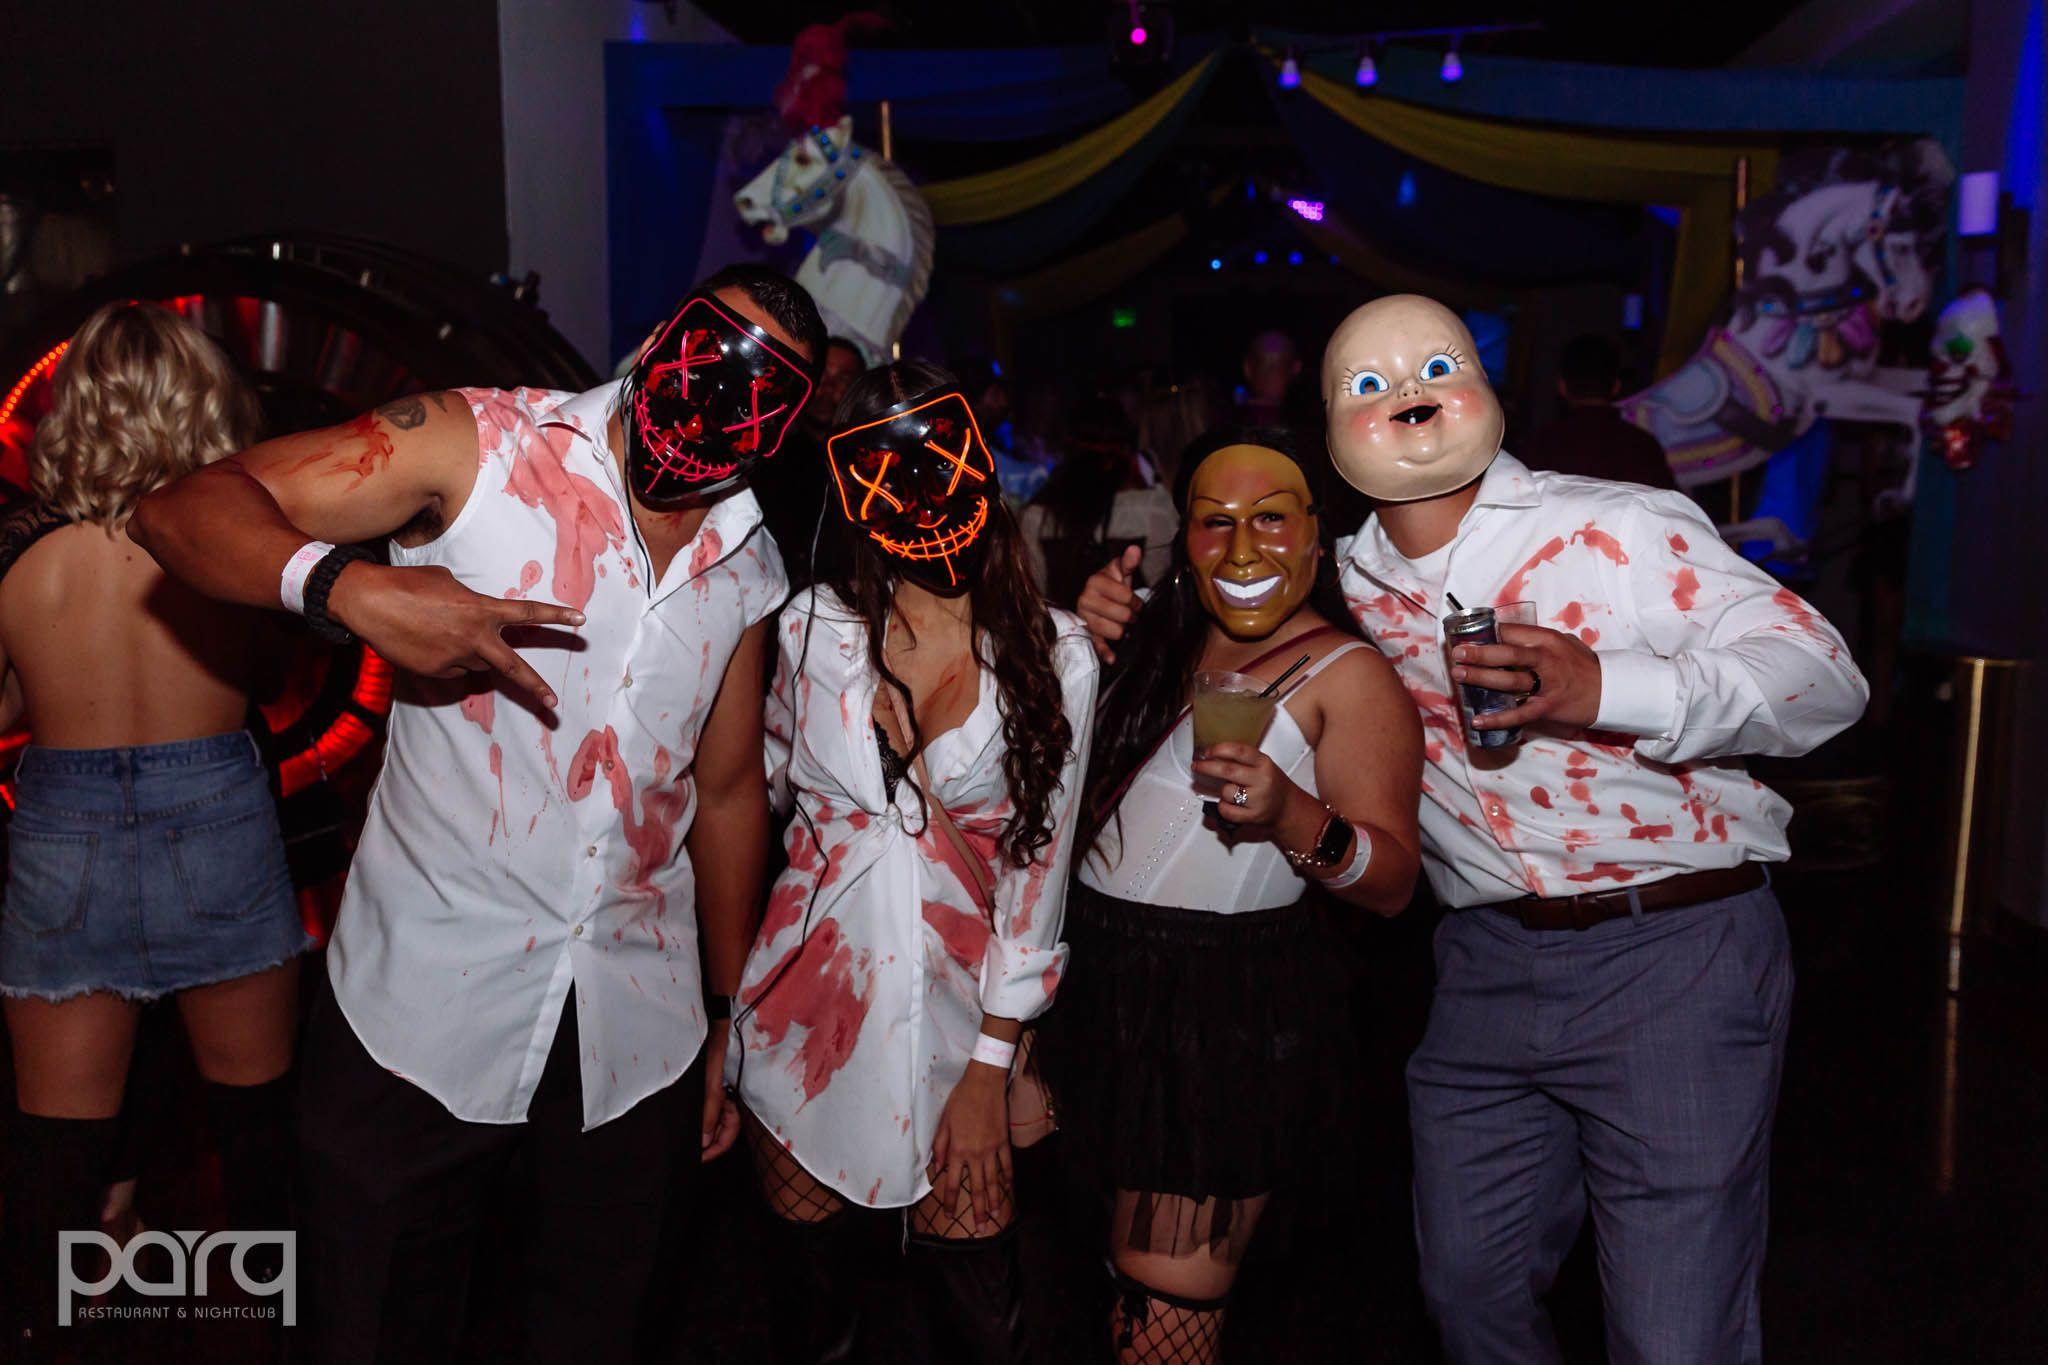 10.27.18 Parq - Halloween-20.jpg